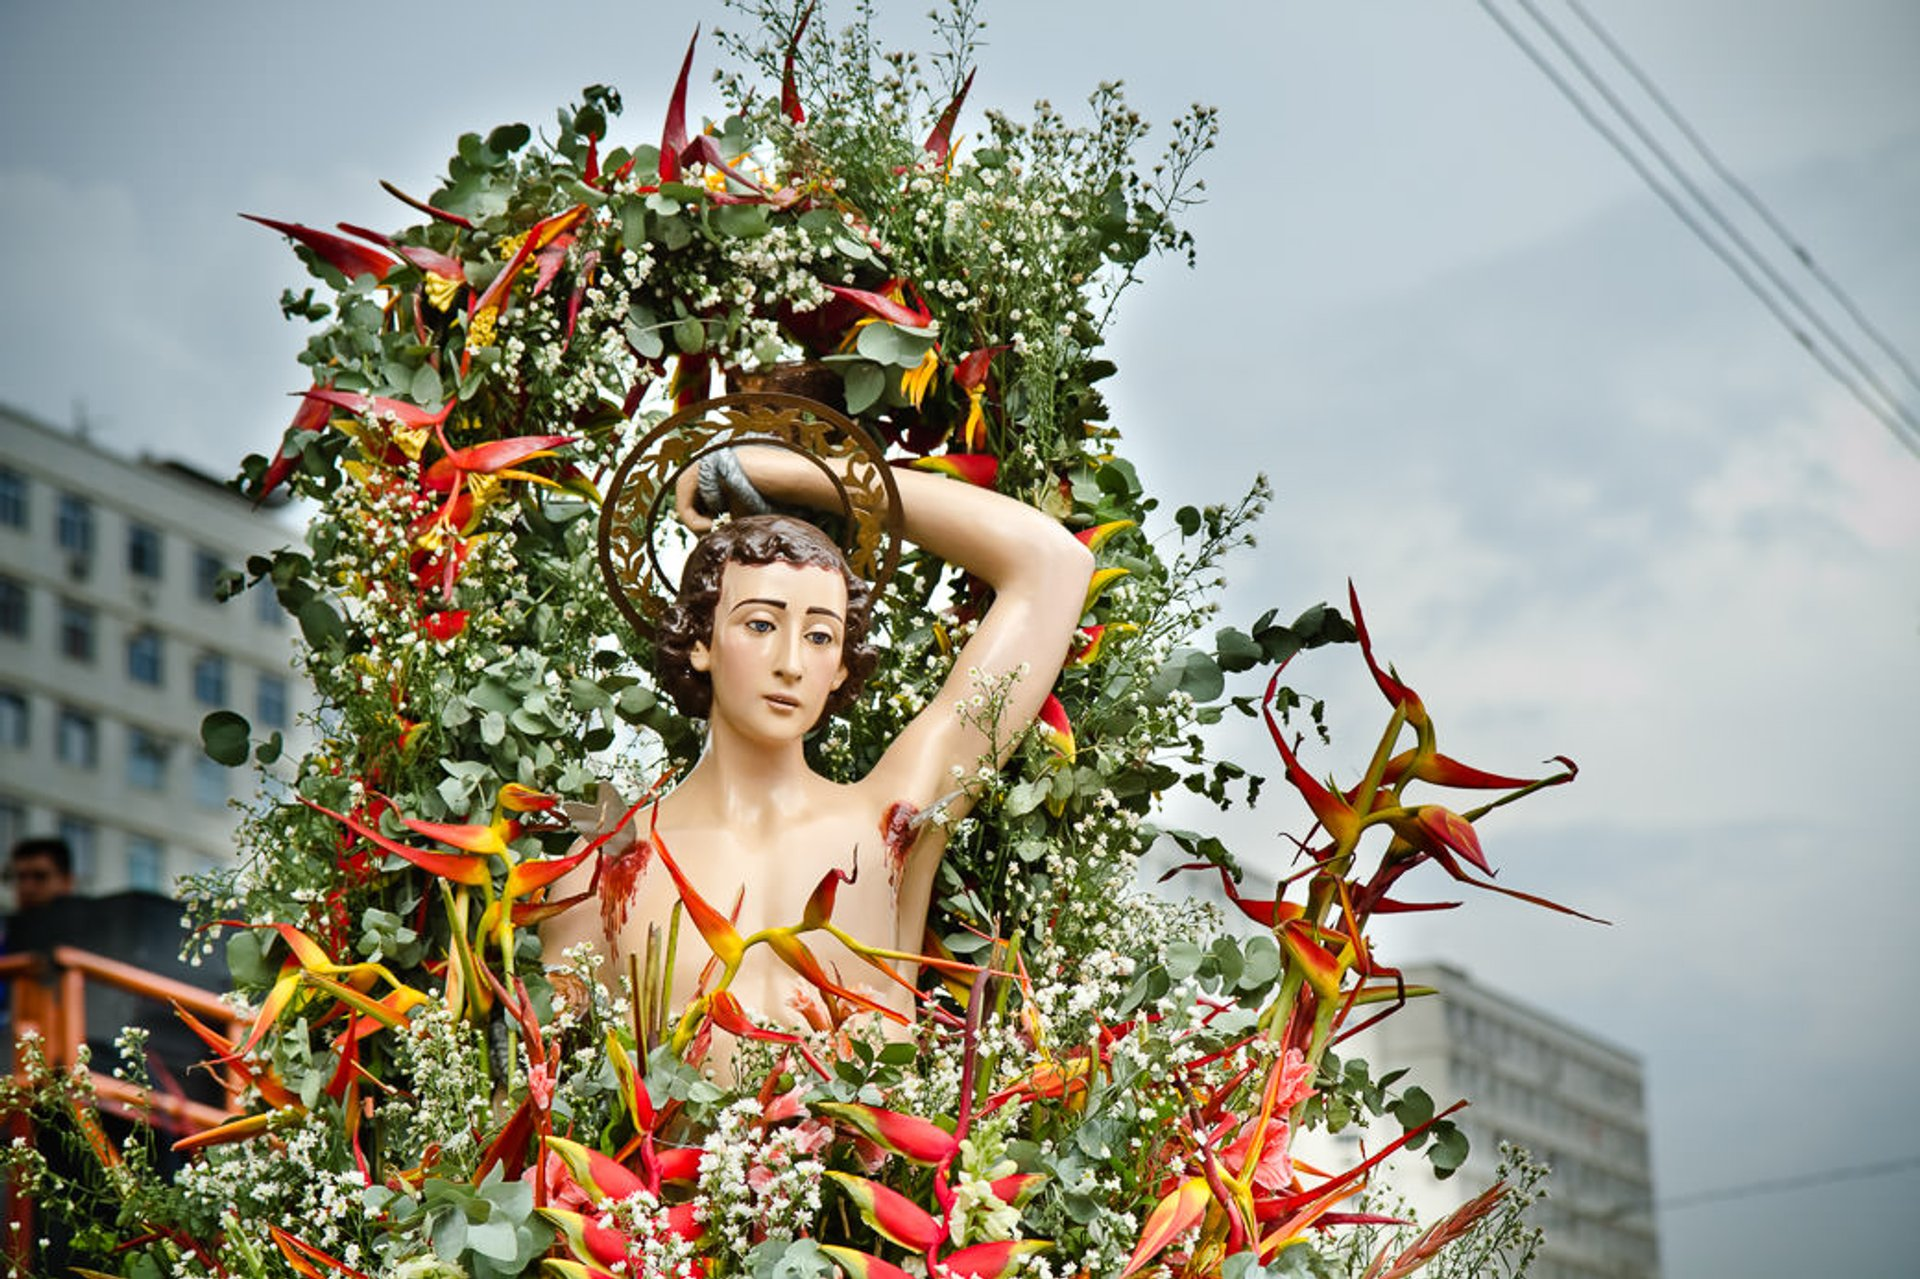 St. Sebastian's Day in Rio de Janeiro 2020 - Best Time